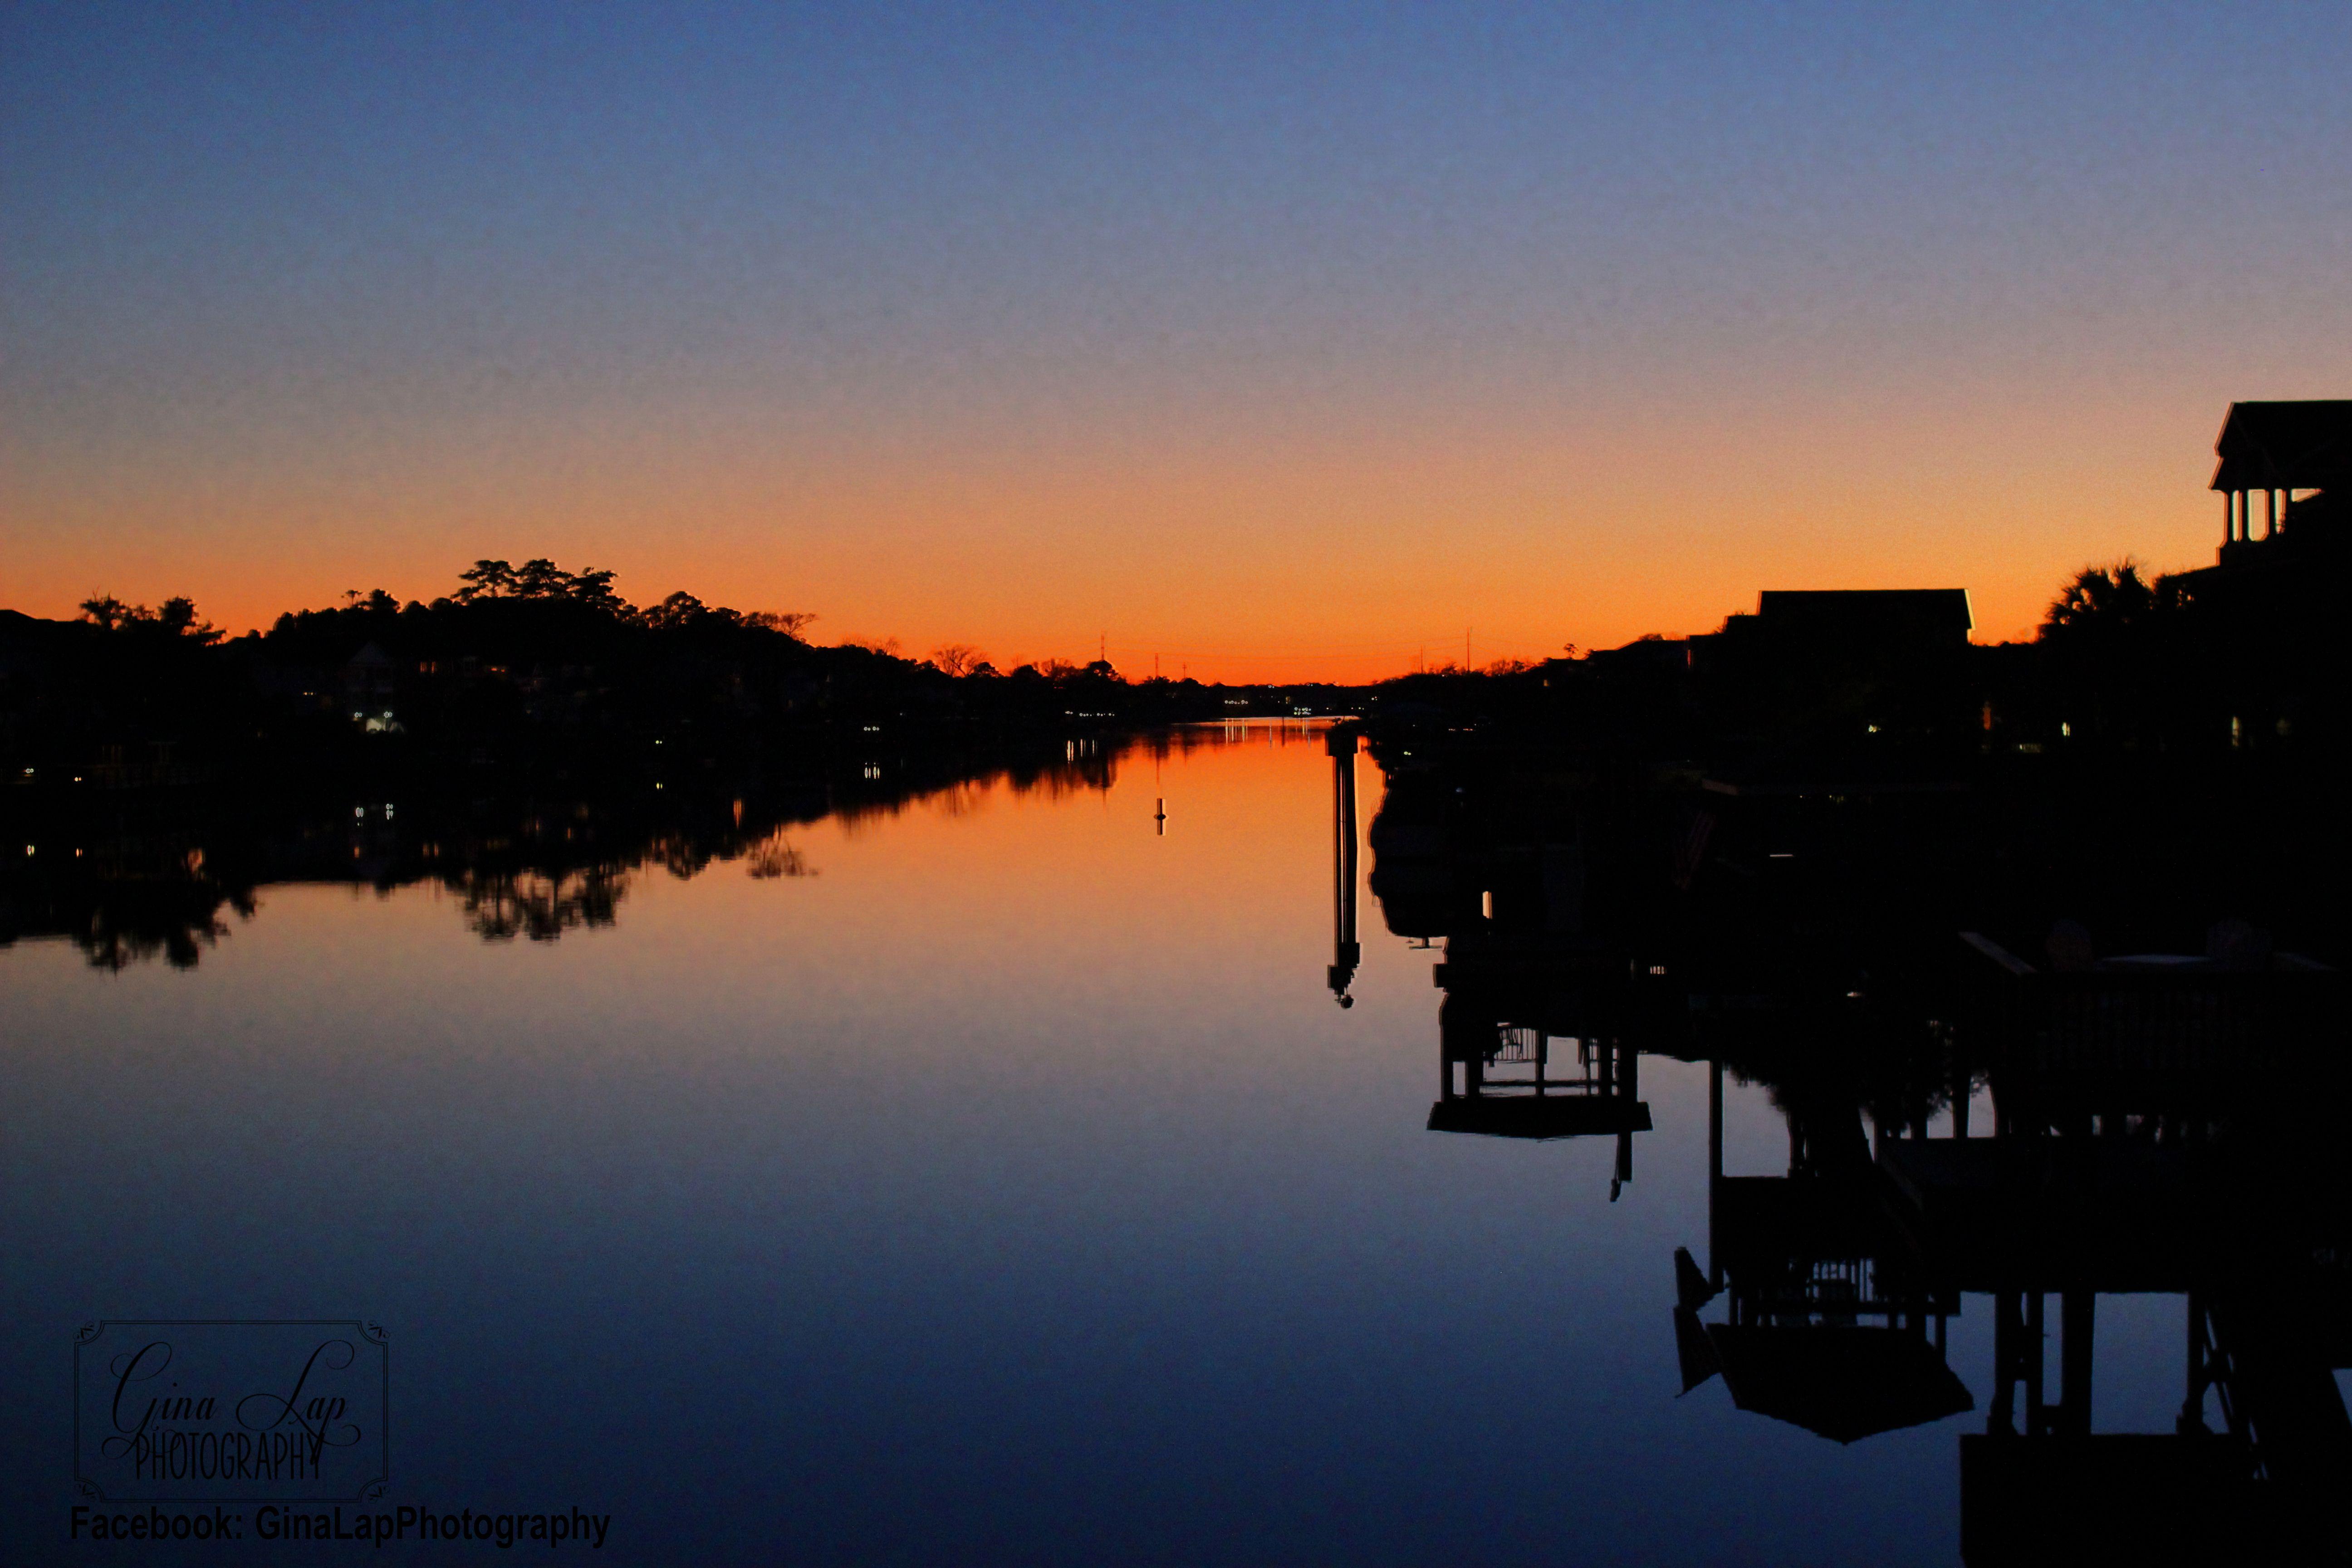 Intracoastal waterway sunset sc wwwginalapphotography